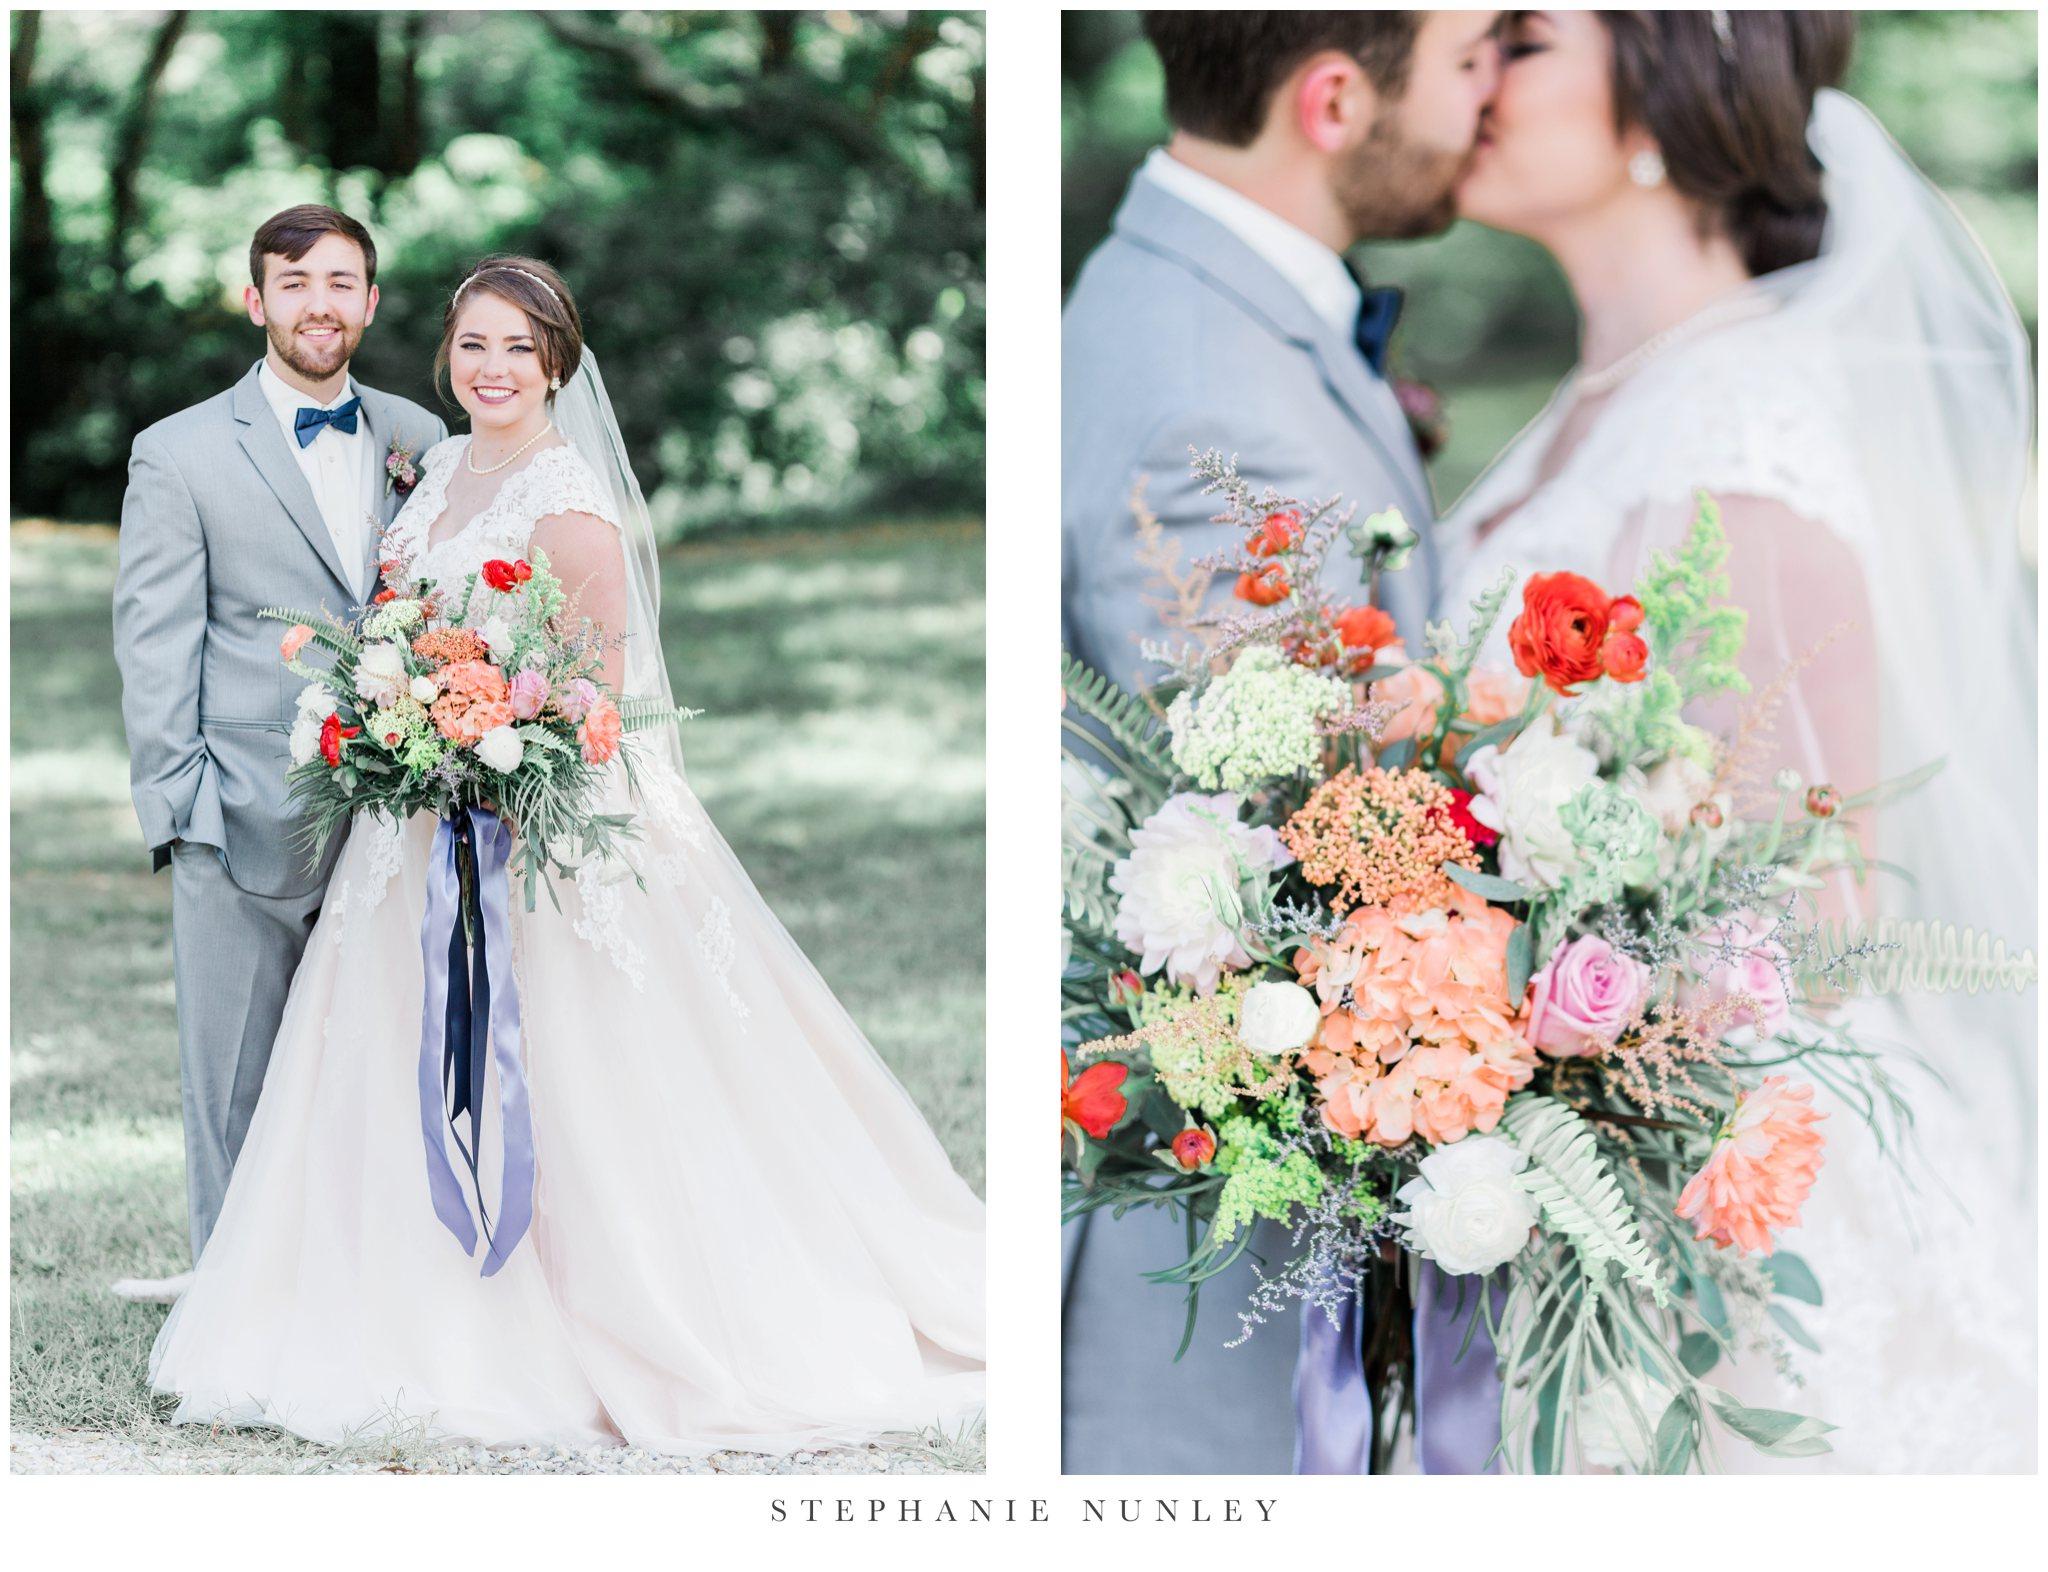 arkansas-wedding-with-lush-wildflower-bouquet-0047.jpg